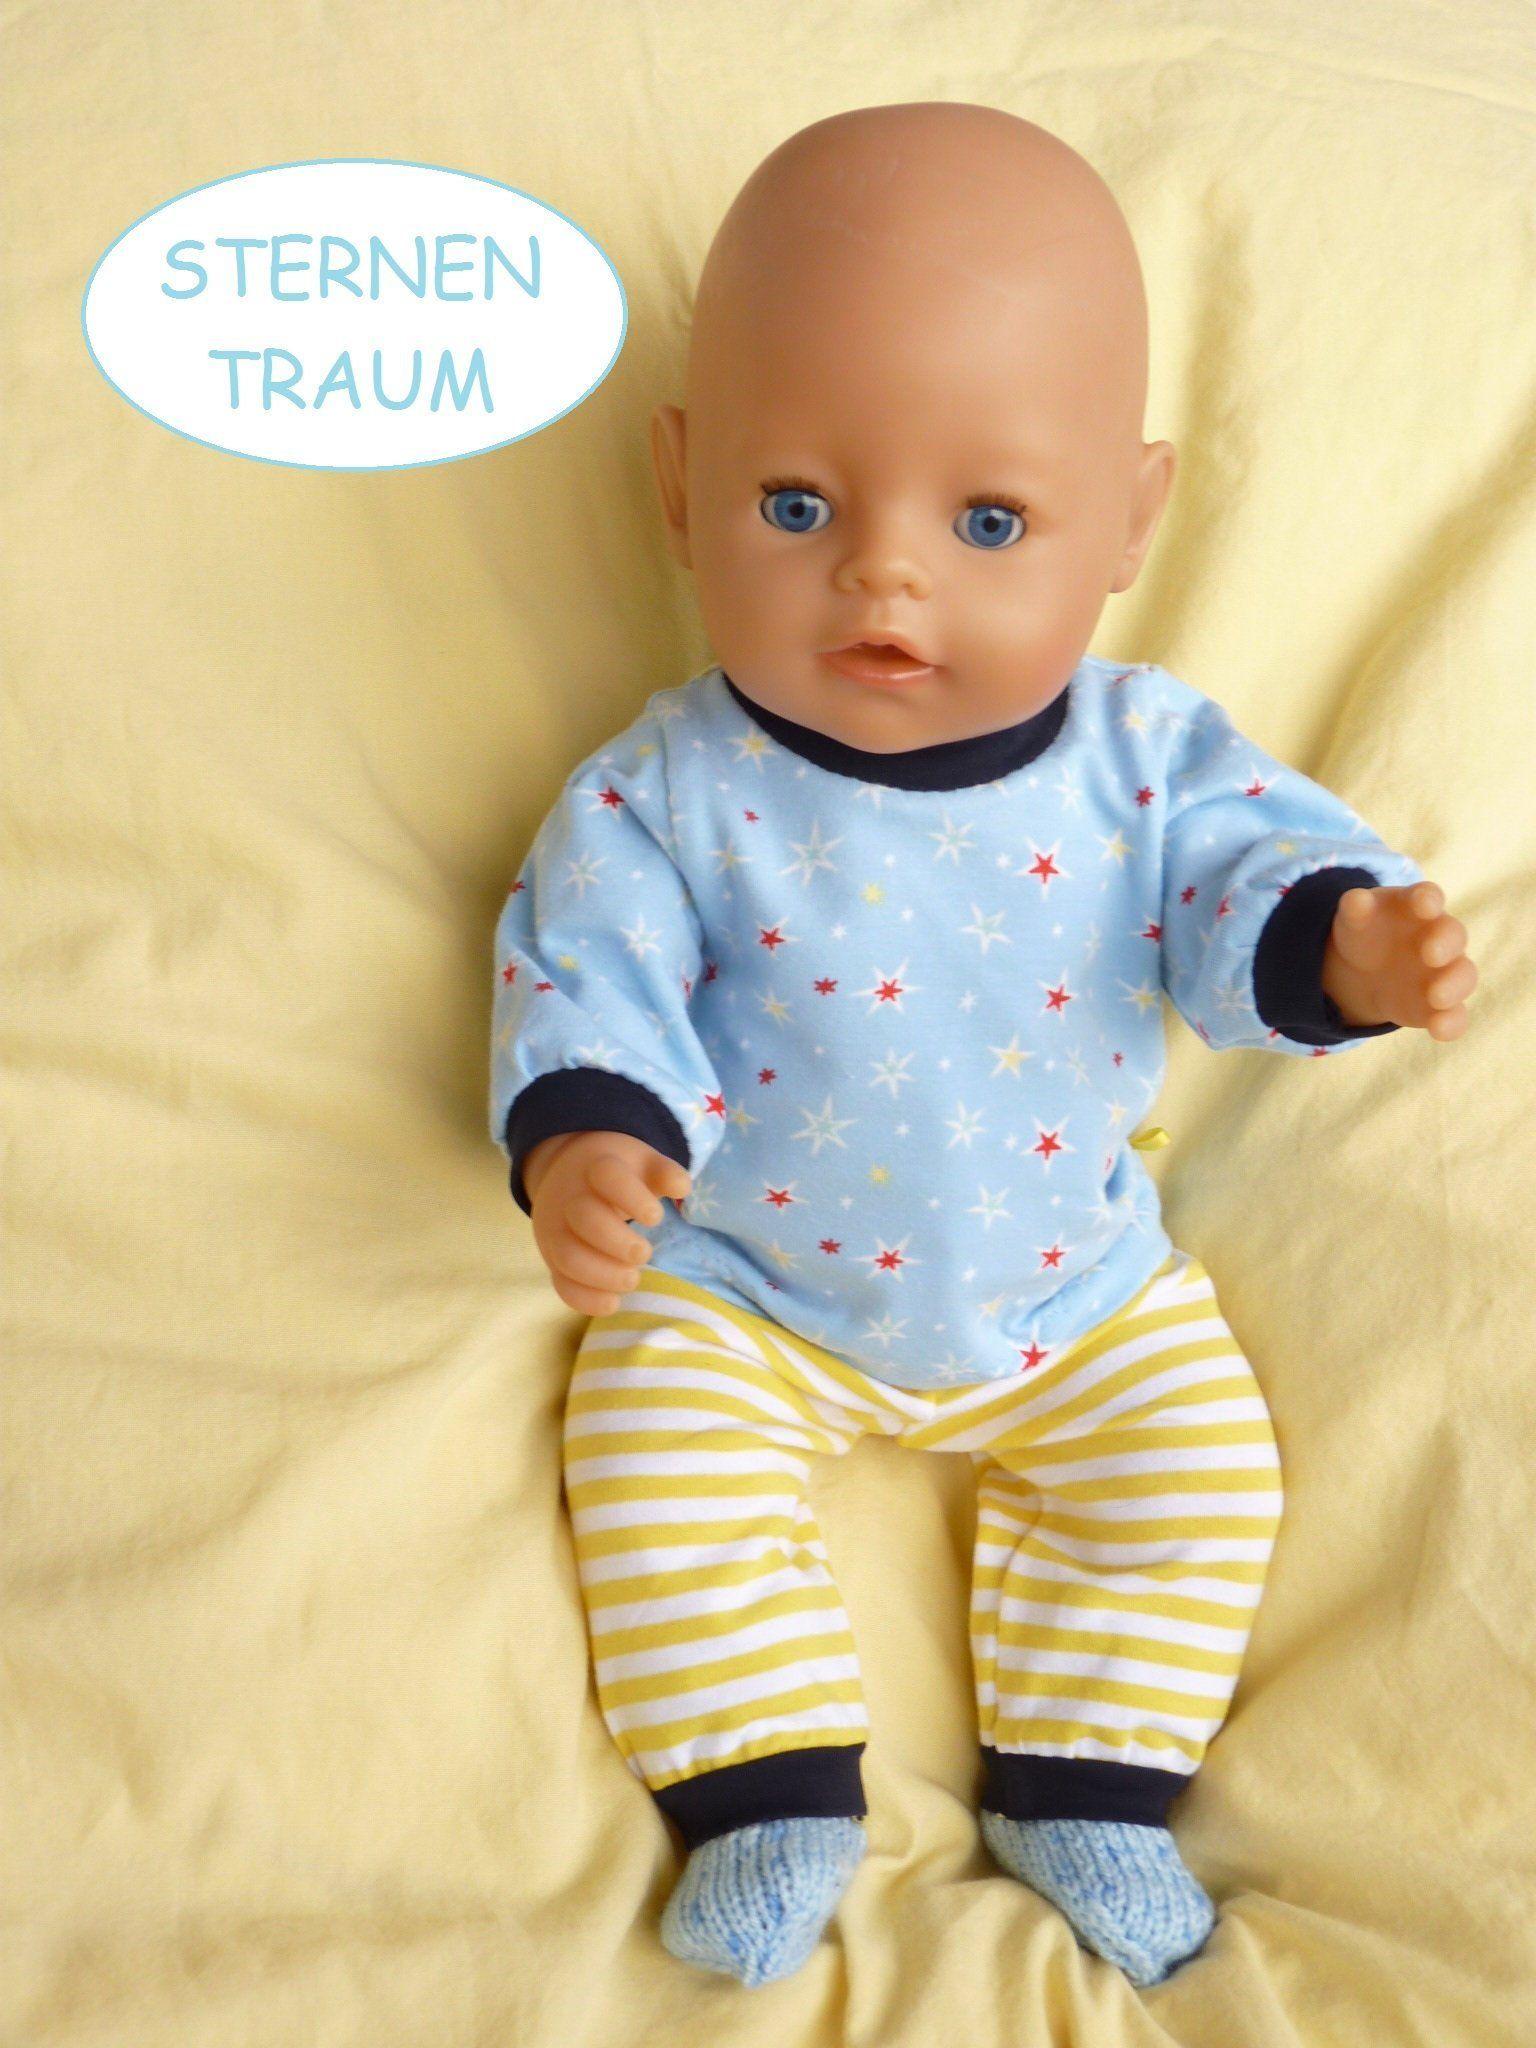 Puppenkleidung 43cm Z B Fur Babyborn Brother Gr 40 45cm 3tlg Set Junge Puppenschlafanzug Stricksocken Hellblau Sterne Streifen In 2020 Doll Clothes American Girl Doll Clothes Boys Pajamas